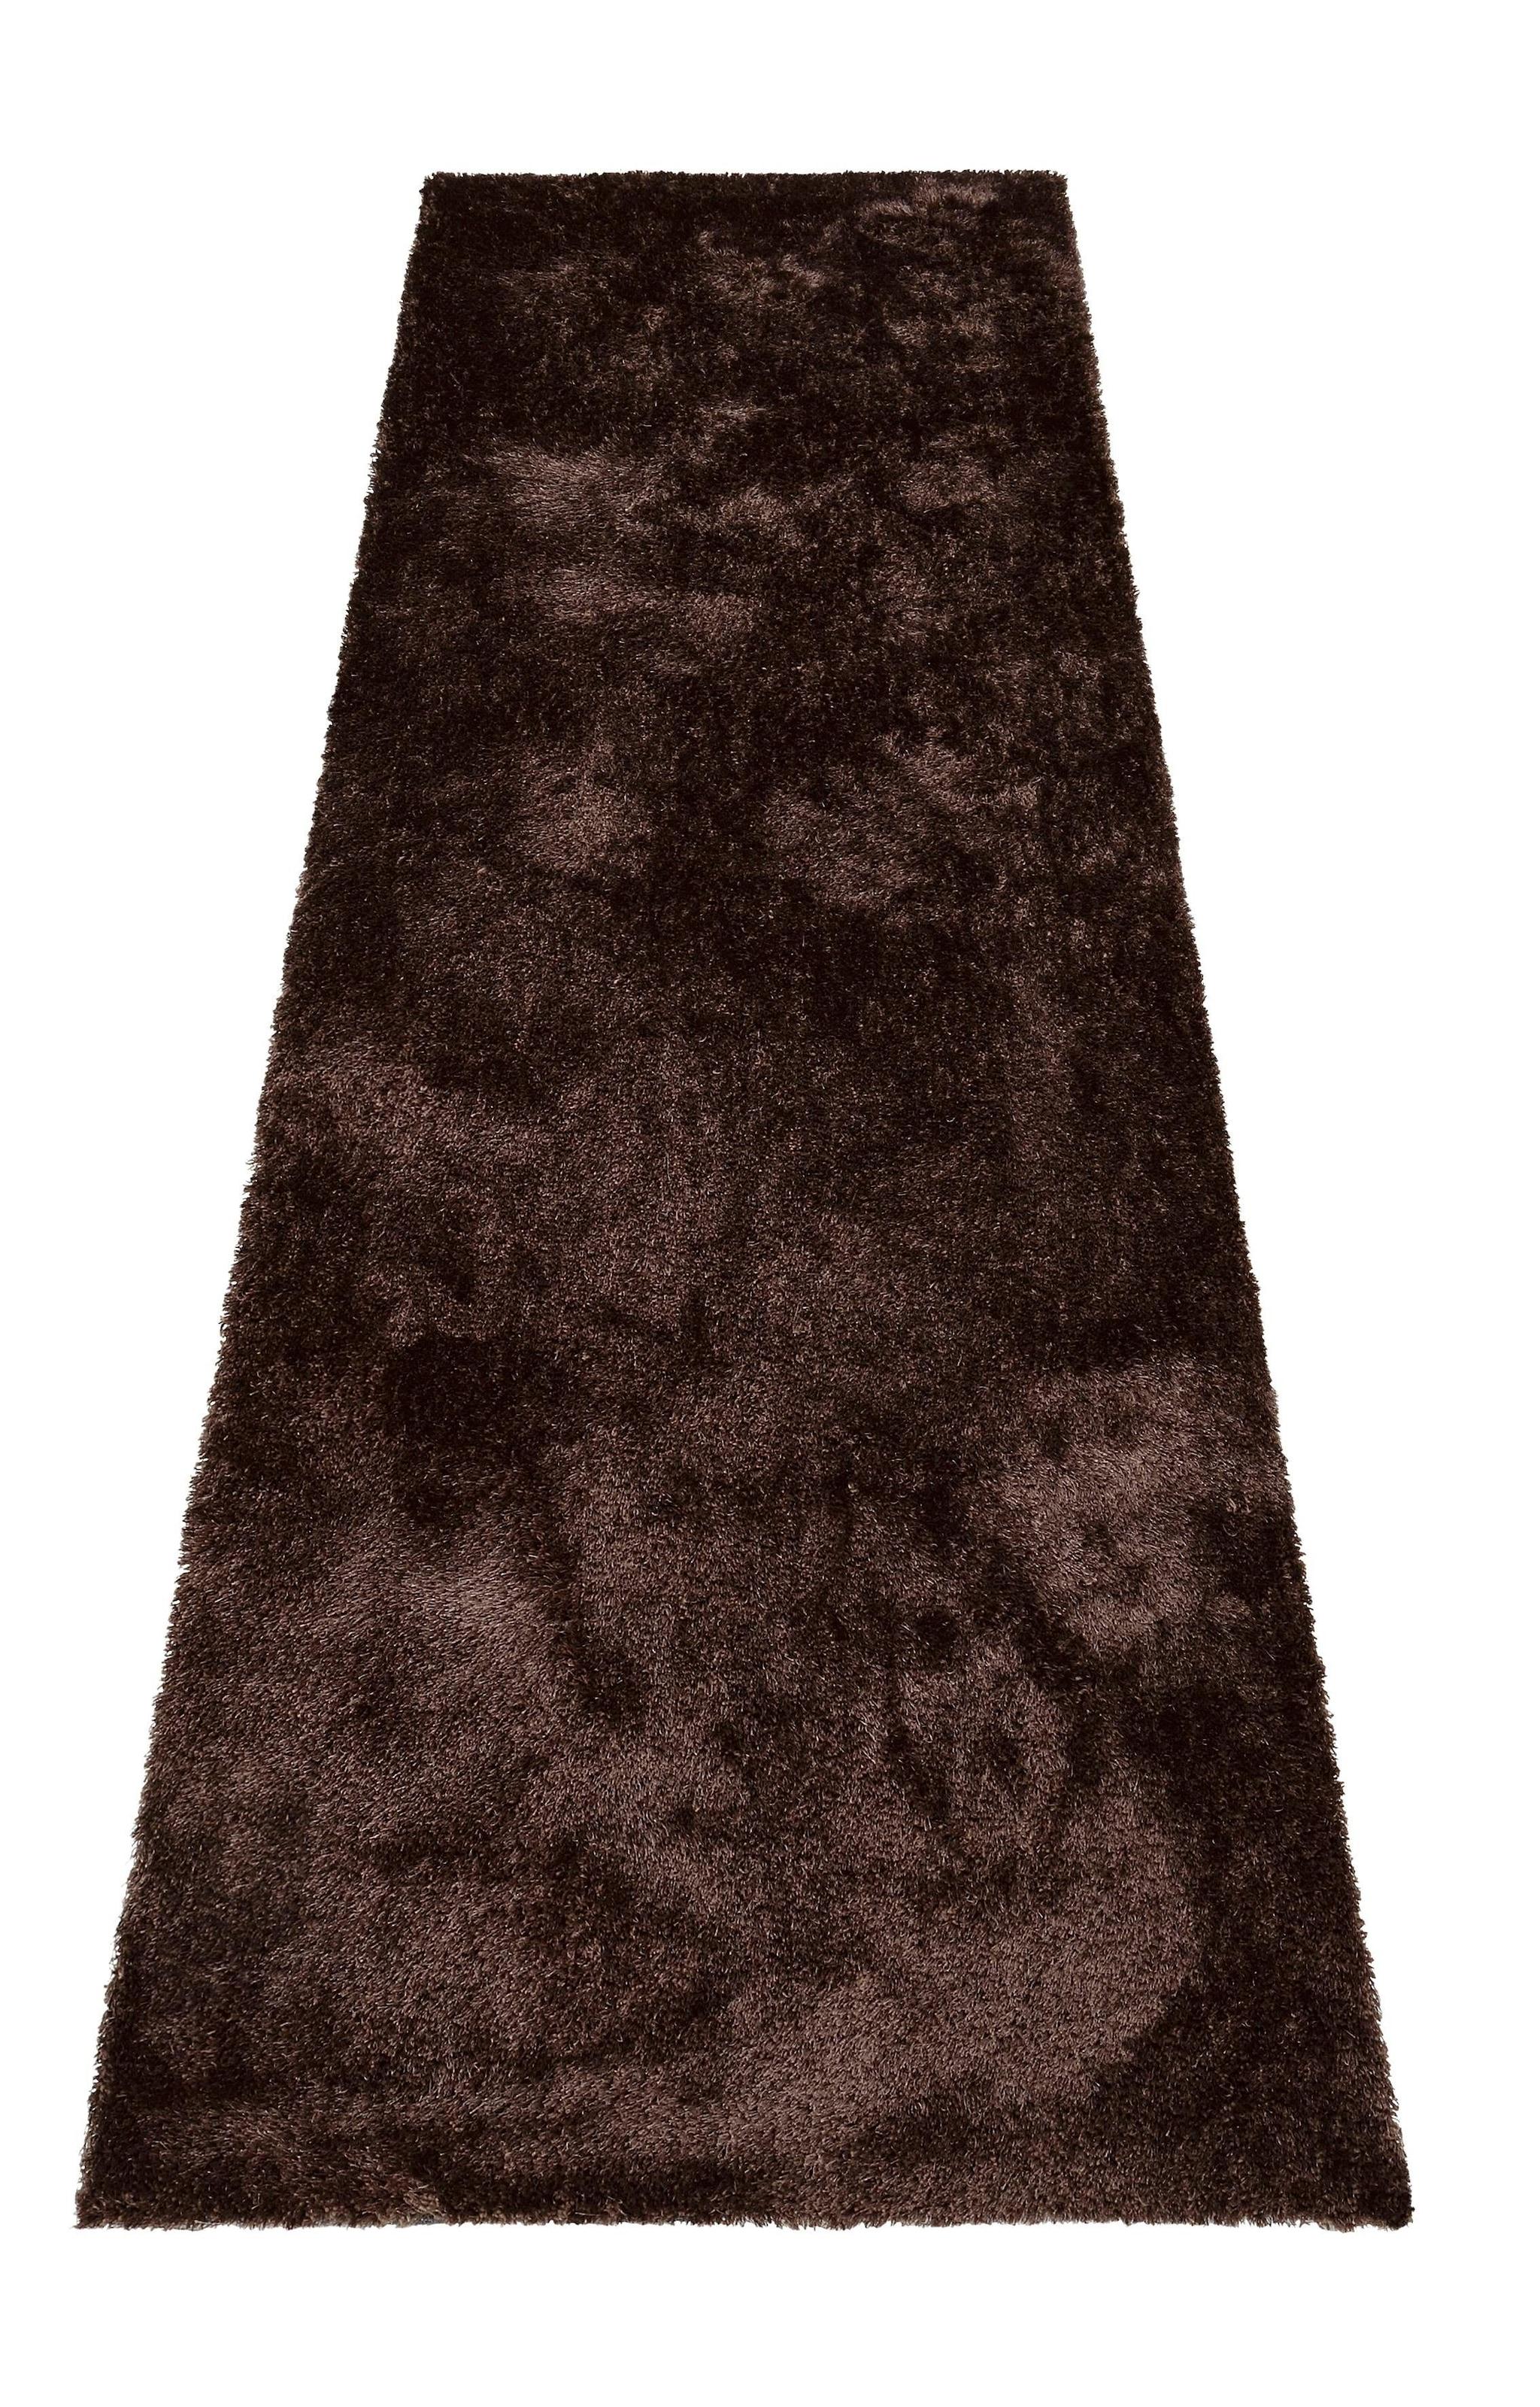 Hochflor Läufer, »Dana«, Bruno Banani, rechteckig, Höhe 30 mm, maschinell gewebt